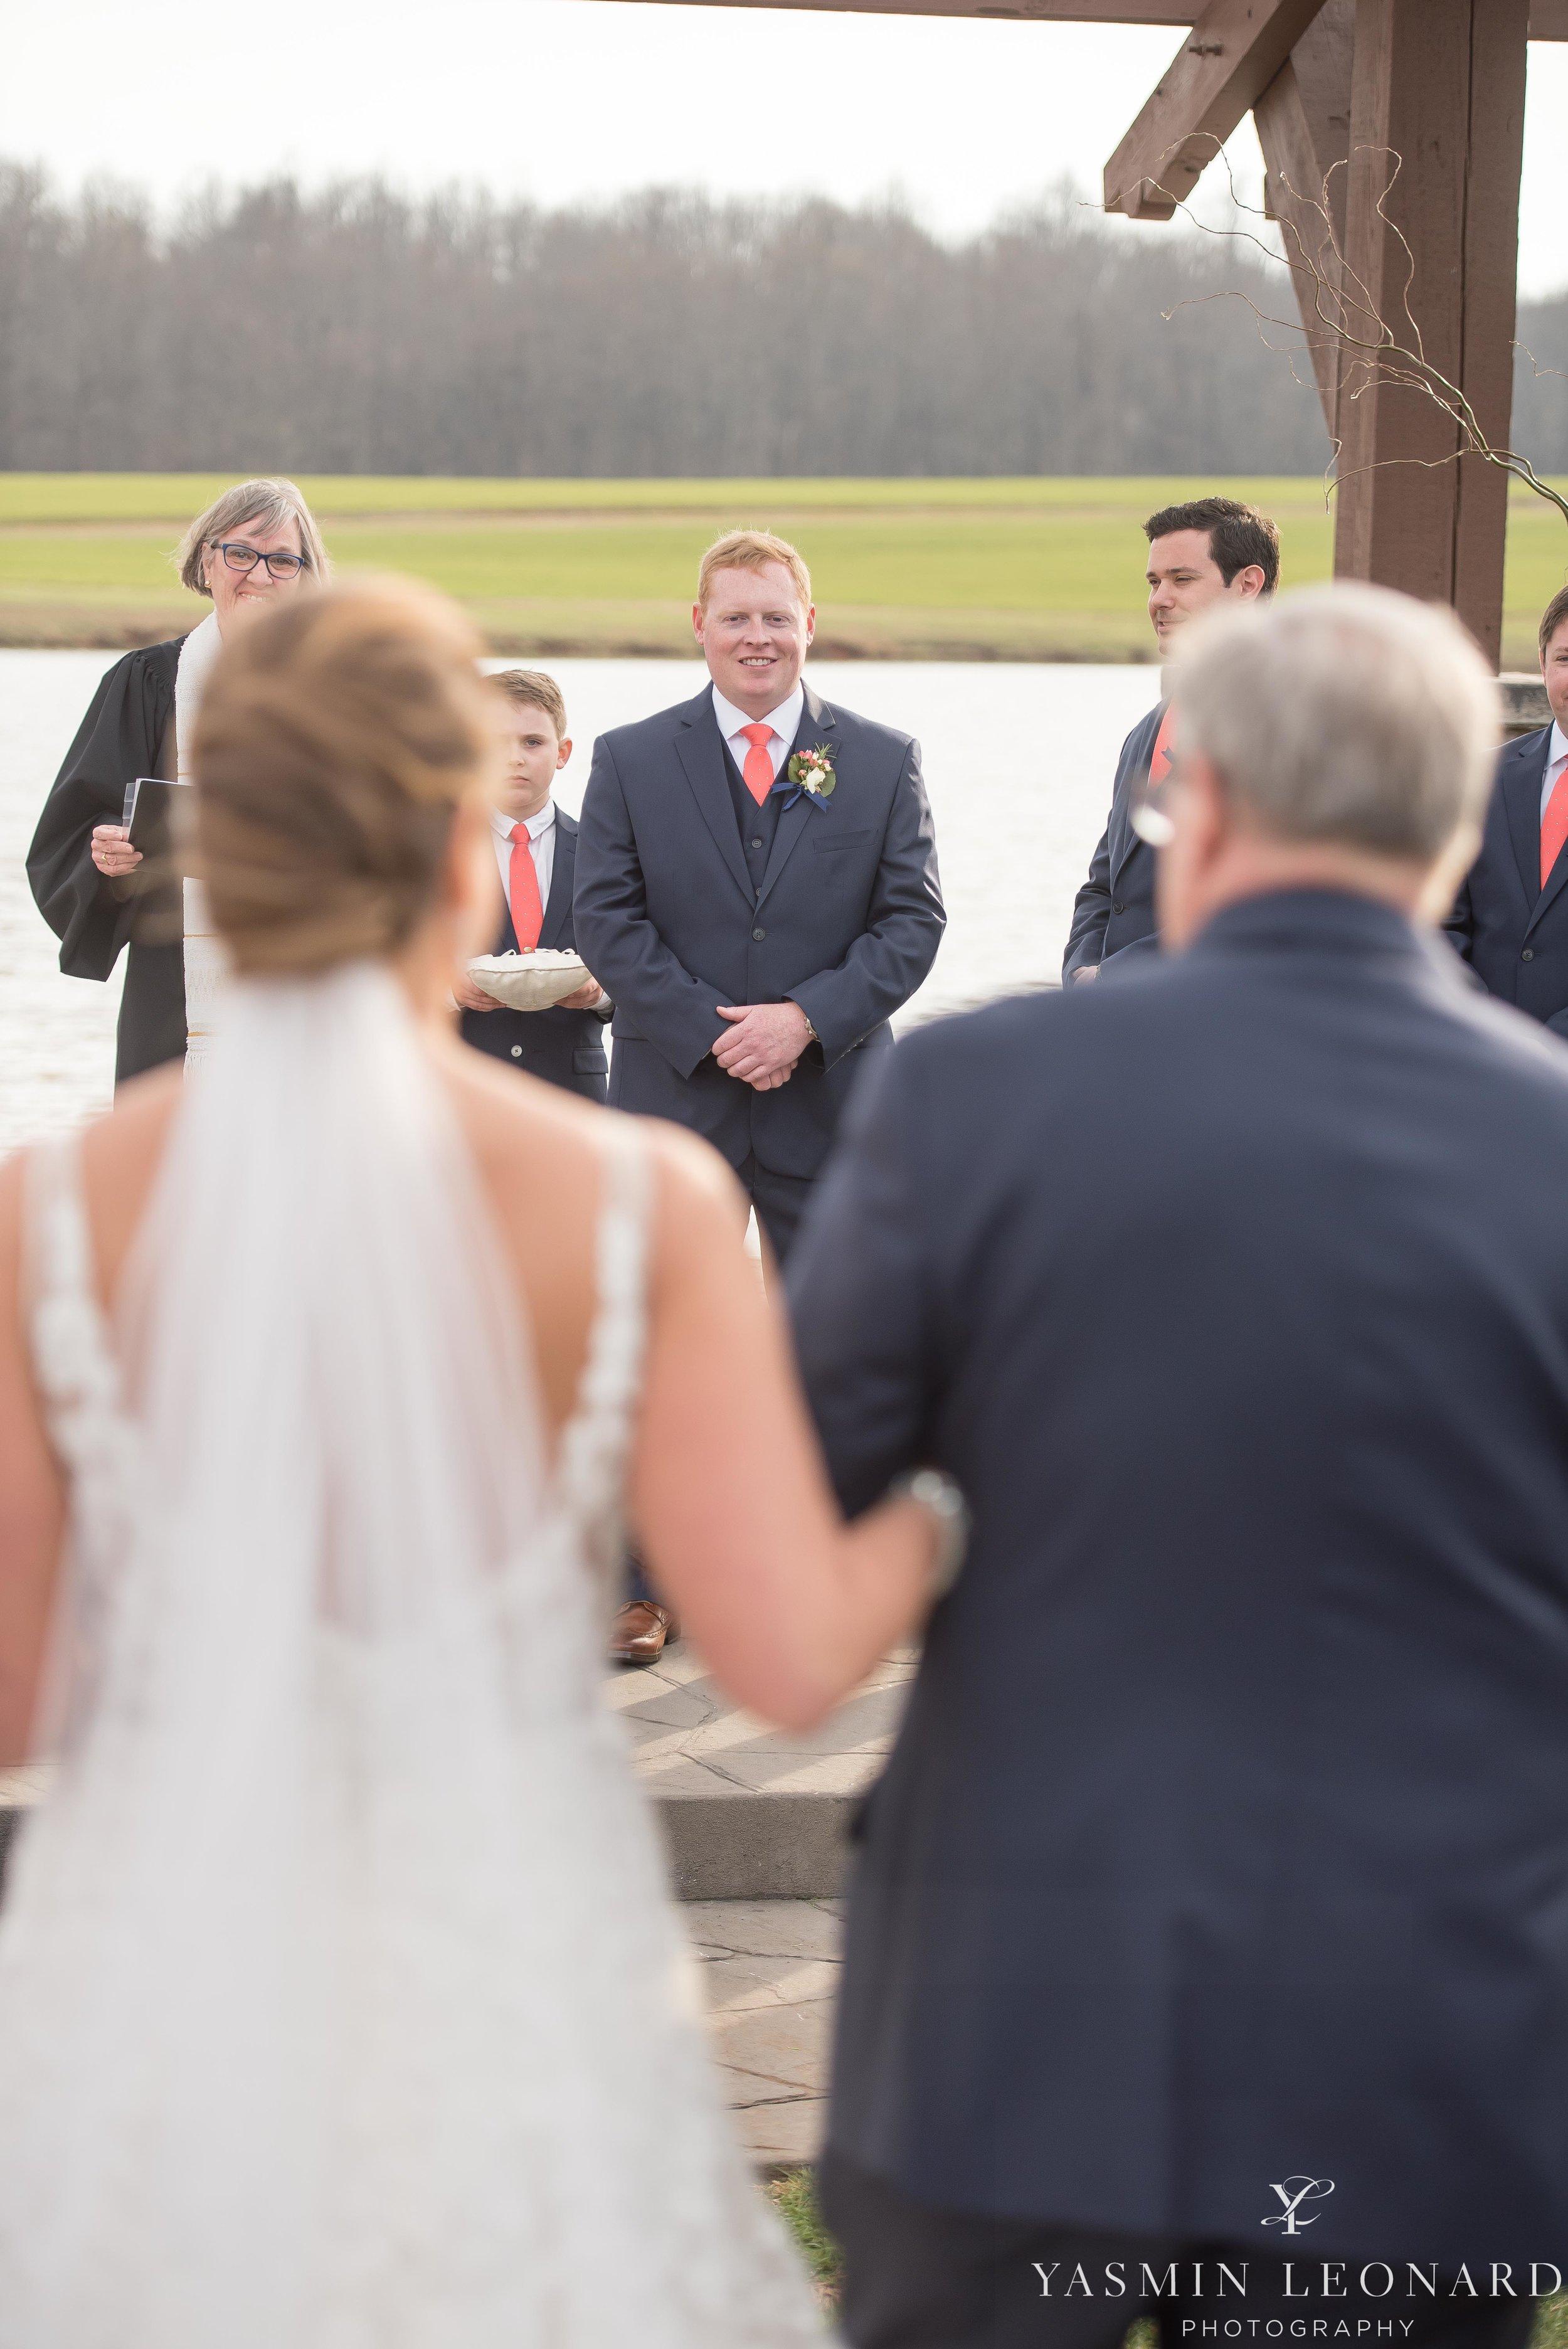 Adaumont Farm - Adaumont Farm Weddings - Trinity Weddings - NC Weddings - Yasmin Leonard Photography-29.jpg